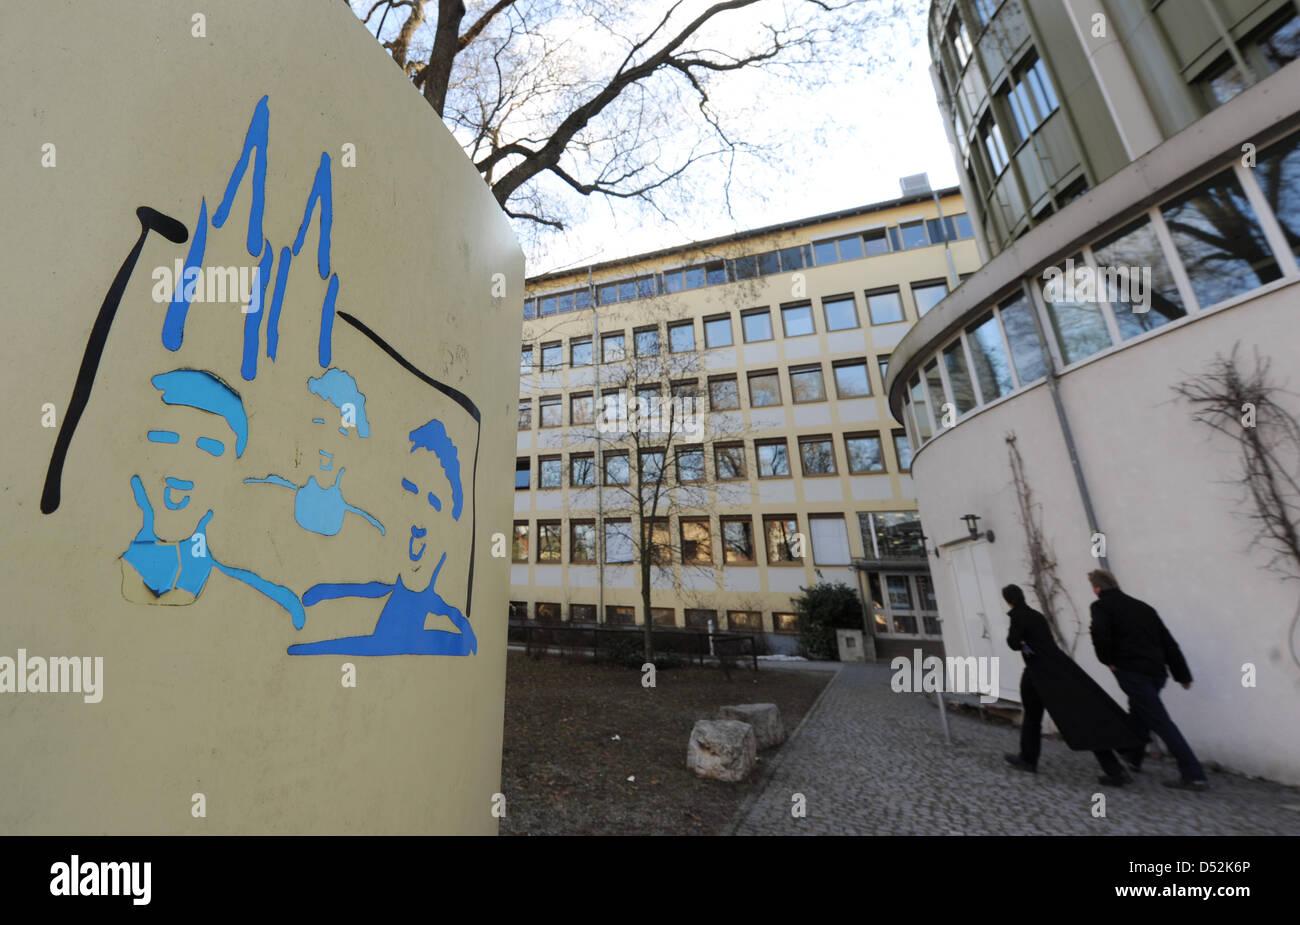 Domspatzen Gymnasium